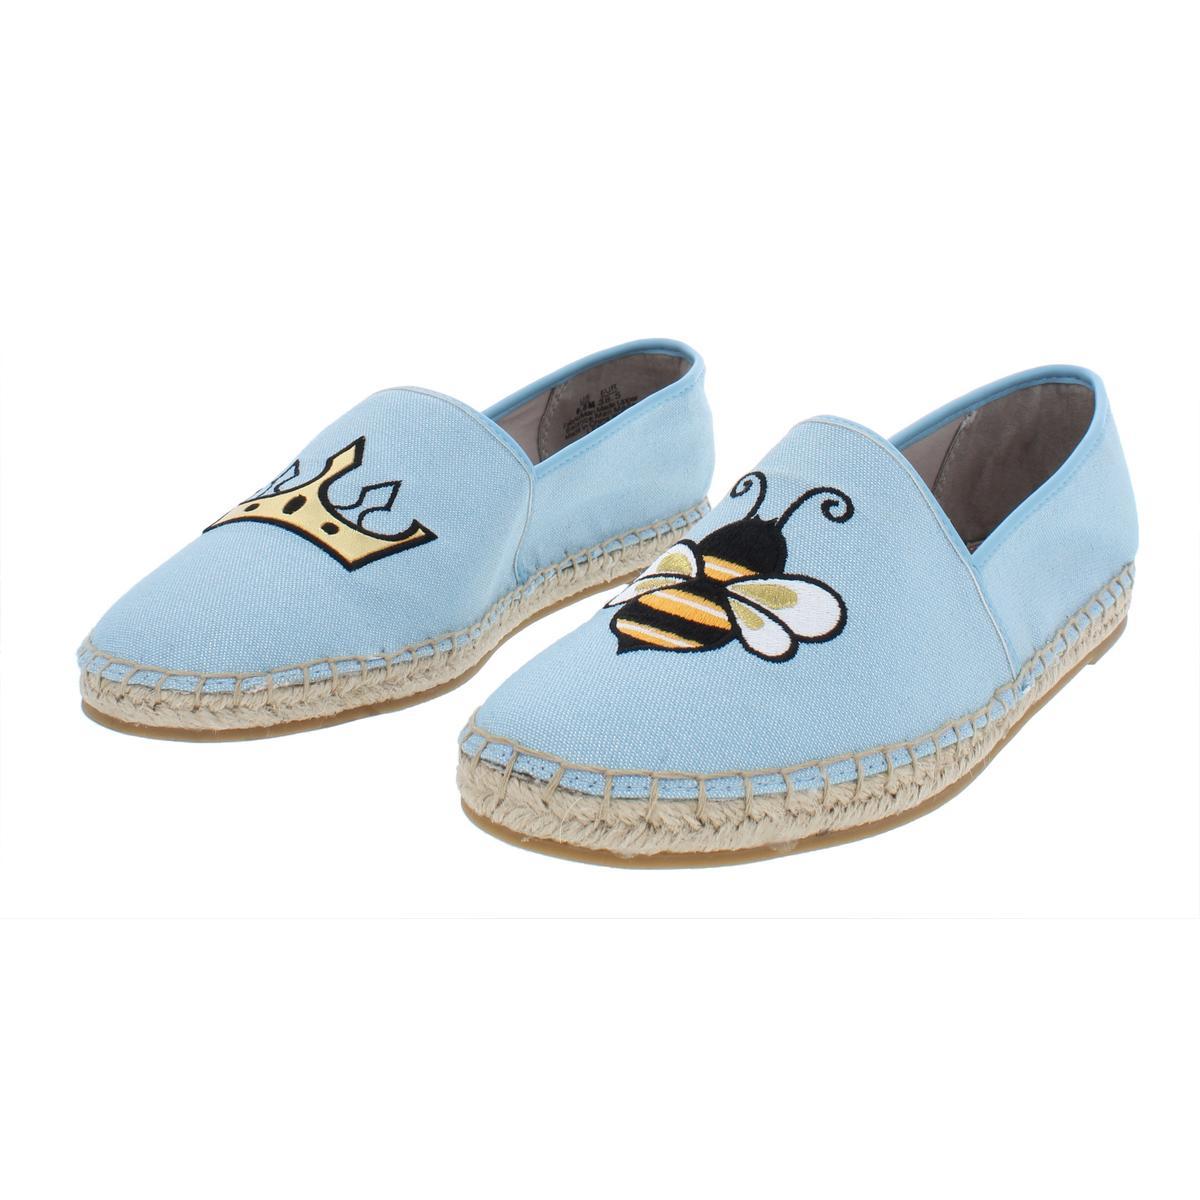 Circus-by-Sam-Edelman-Womens-Leni-6-Canvas-Slip-On-Loafer-Flats-Shoes-BHFO-4603 thumbnail 7